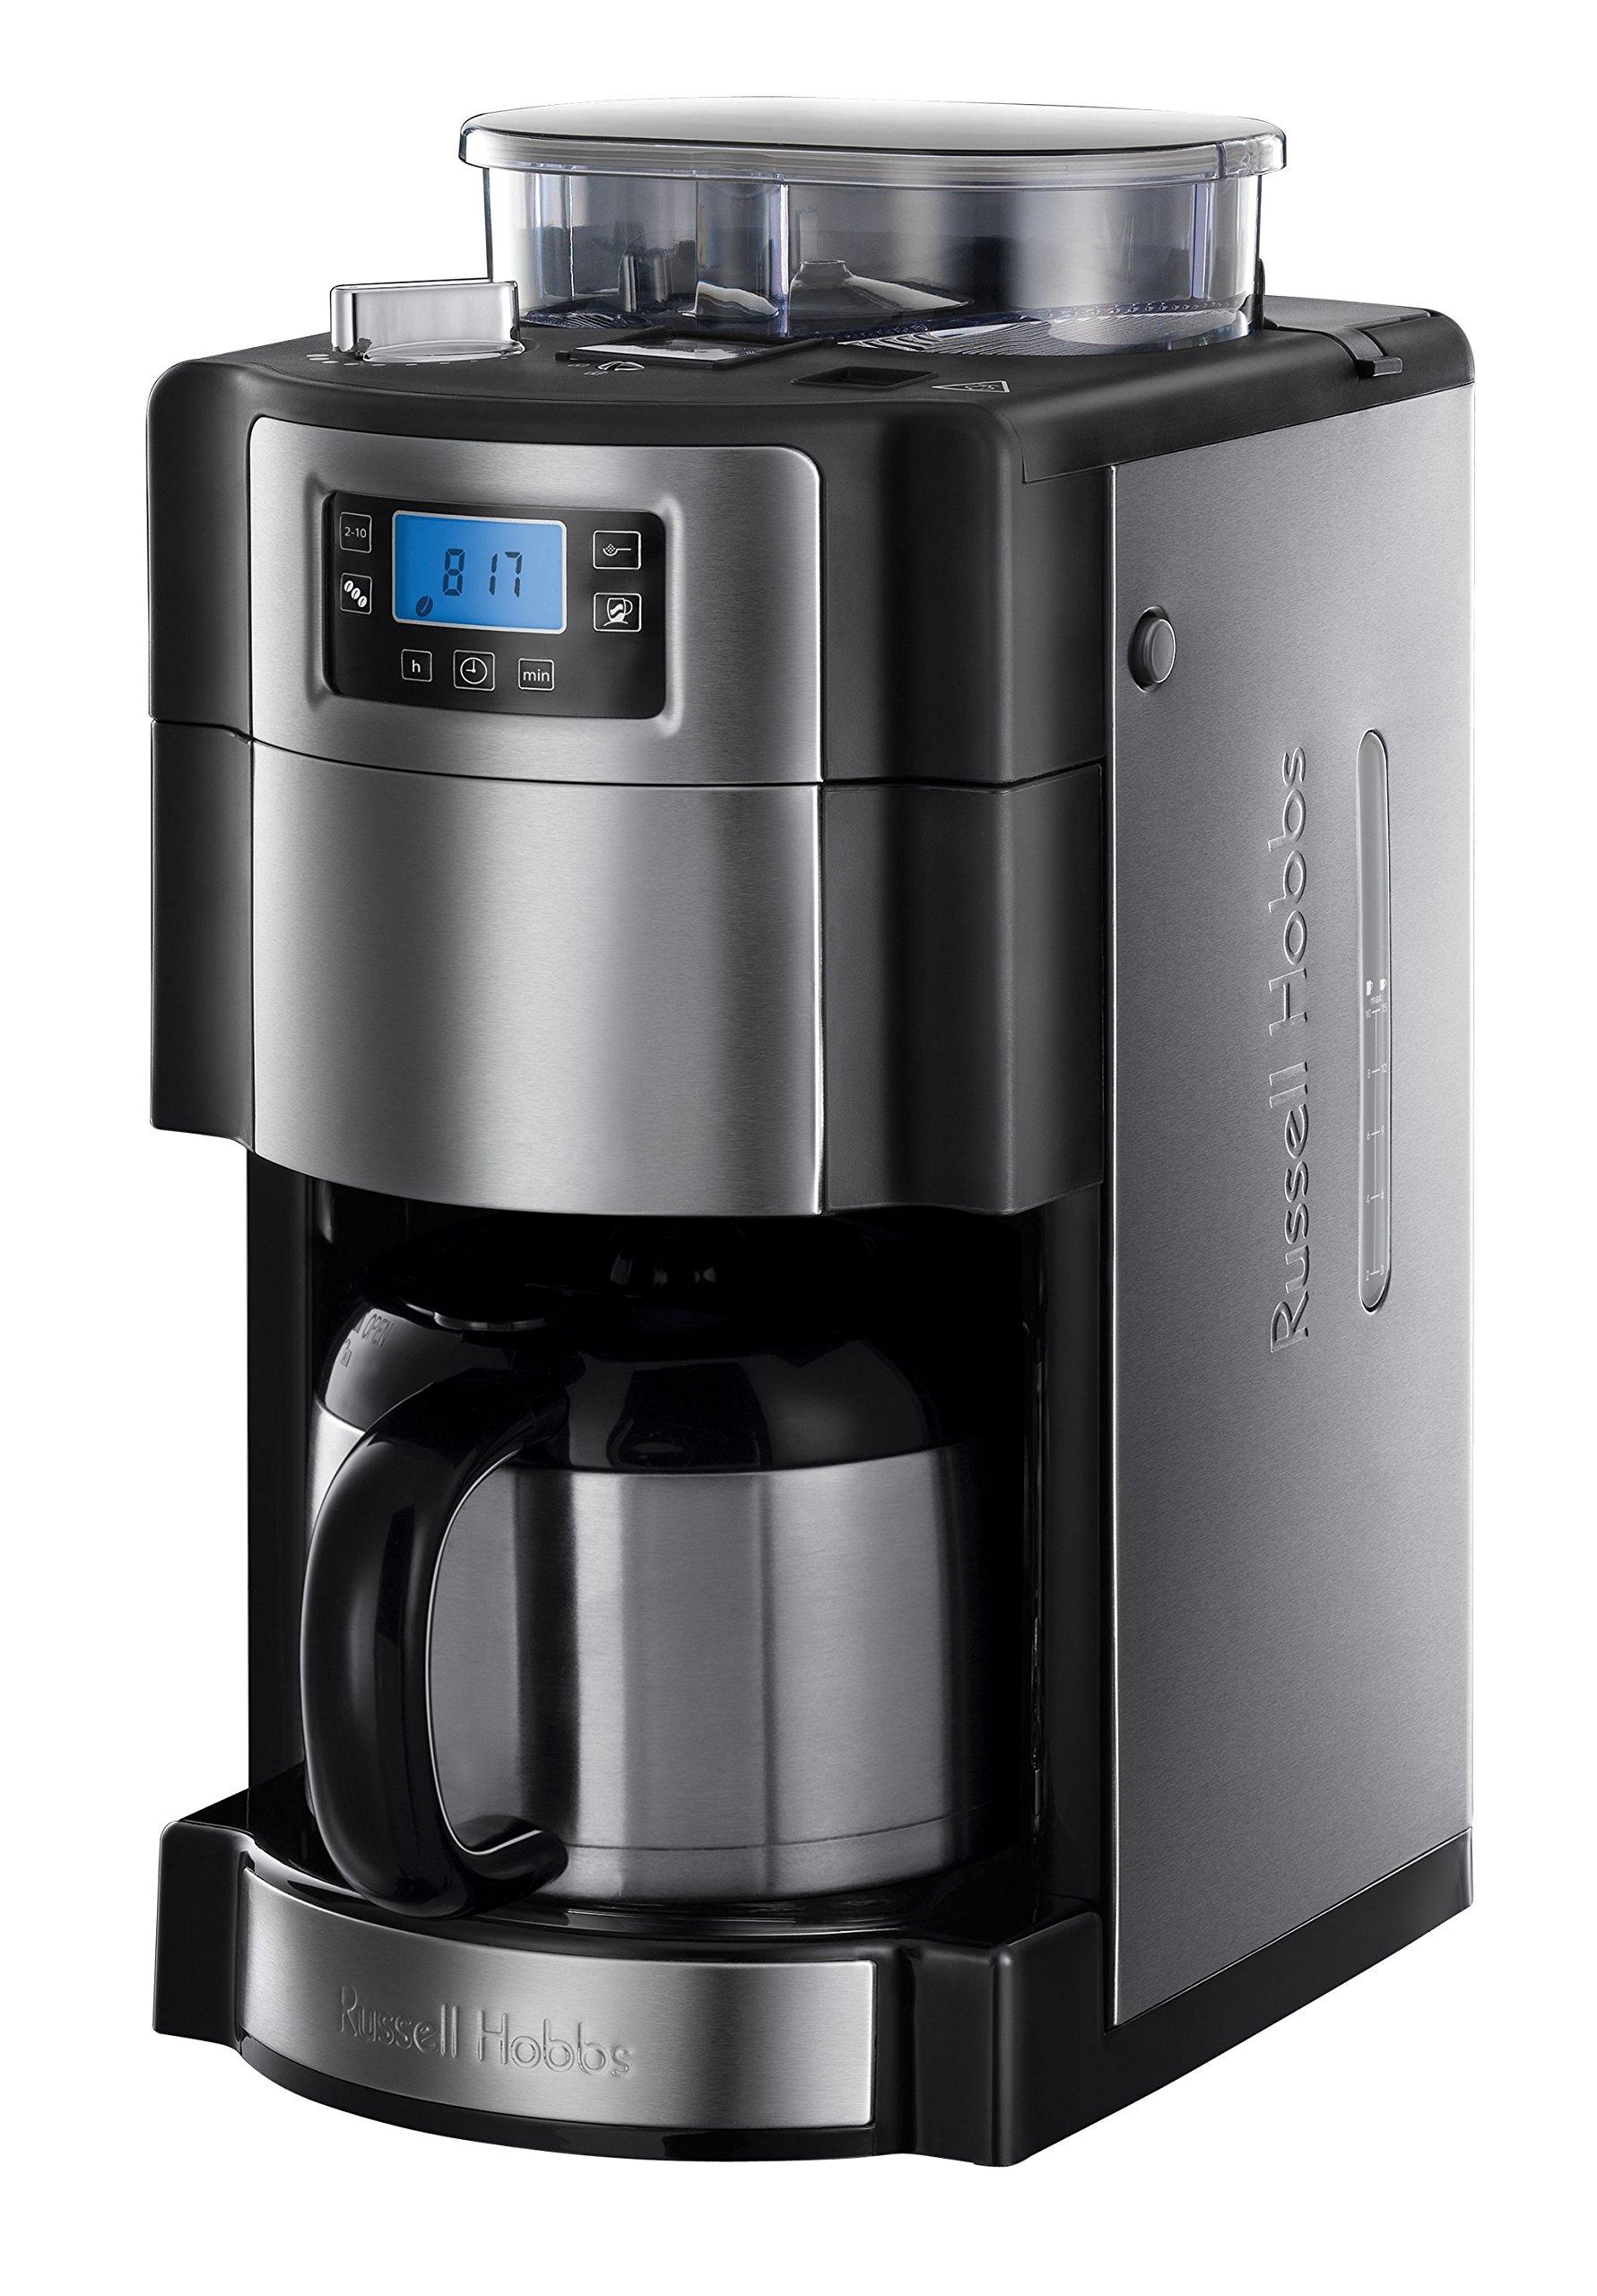 Russell-Hobbs-Digitale-Thermo-Kaffeemaschine-Buckingham-GrindBrew-125l-integriertes-Mahlwerk-Thermokanne-1000-Watt-21430-56-Edelstahlschwarz